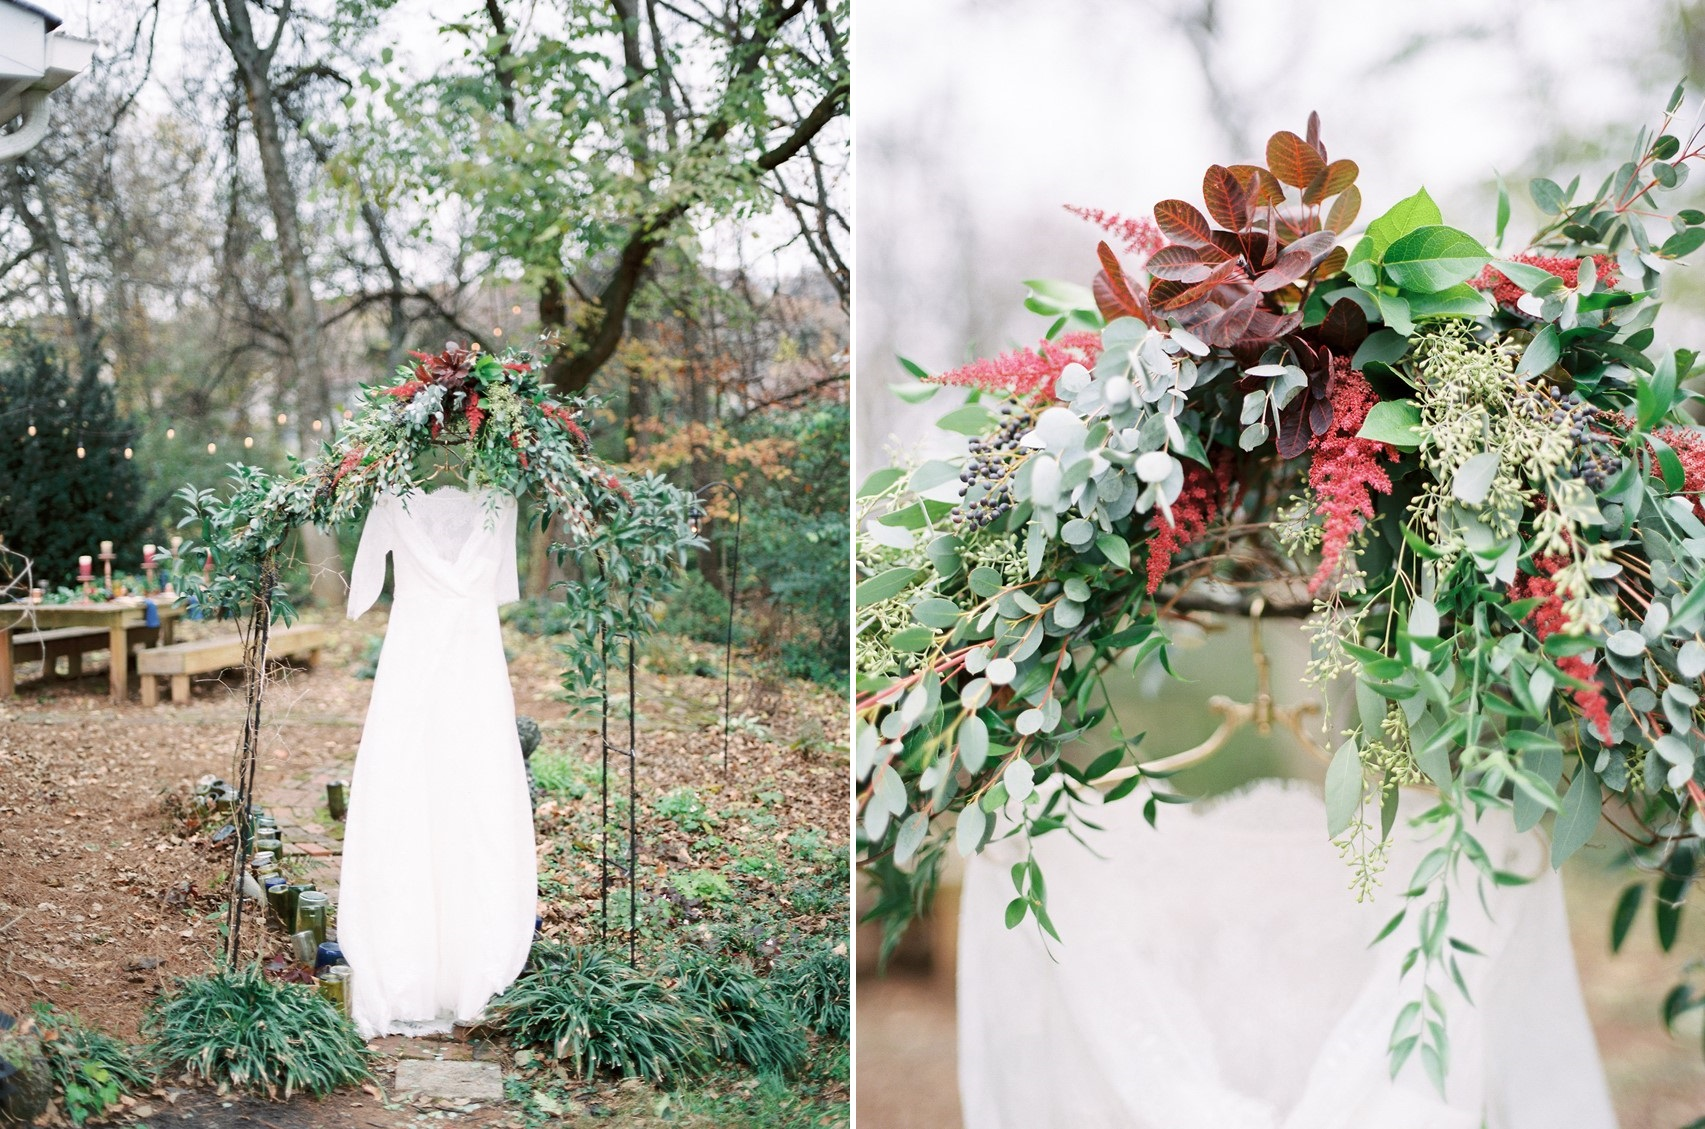 Winter Wedding Dress & Floral Arch